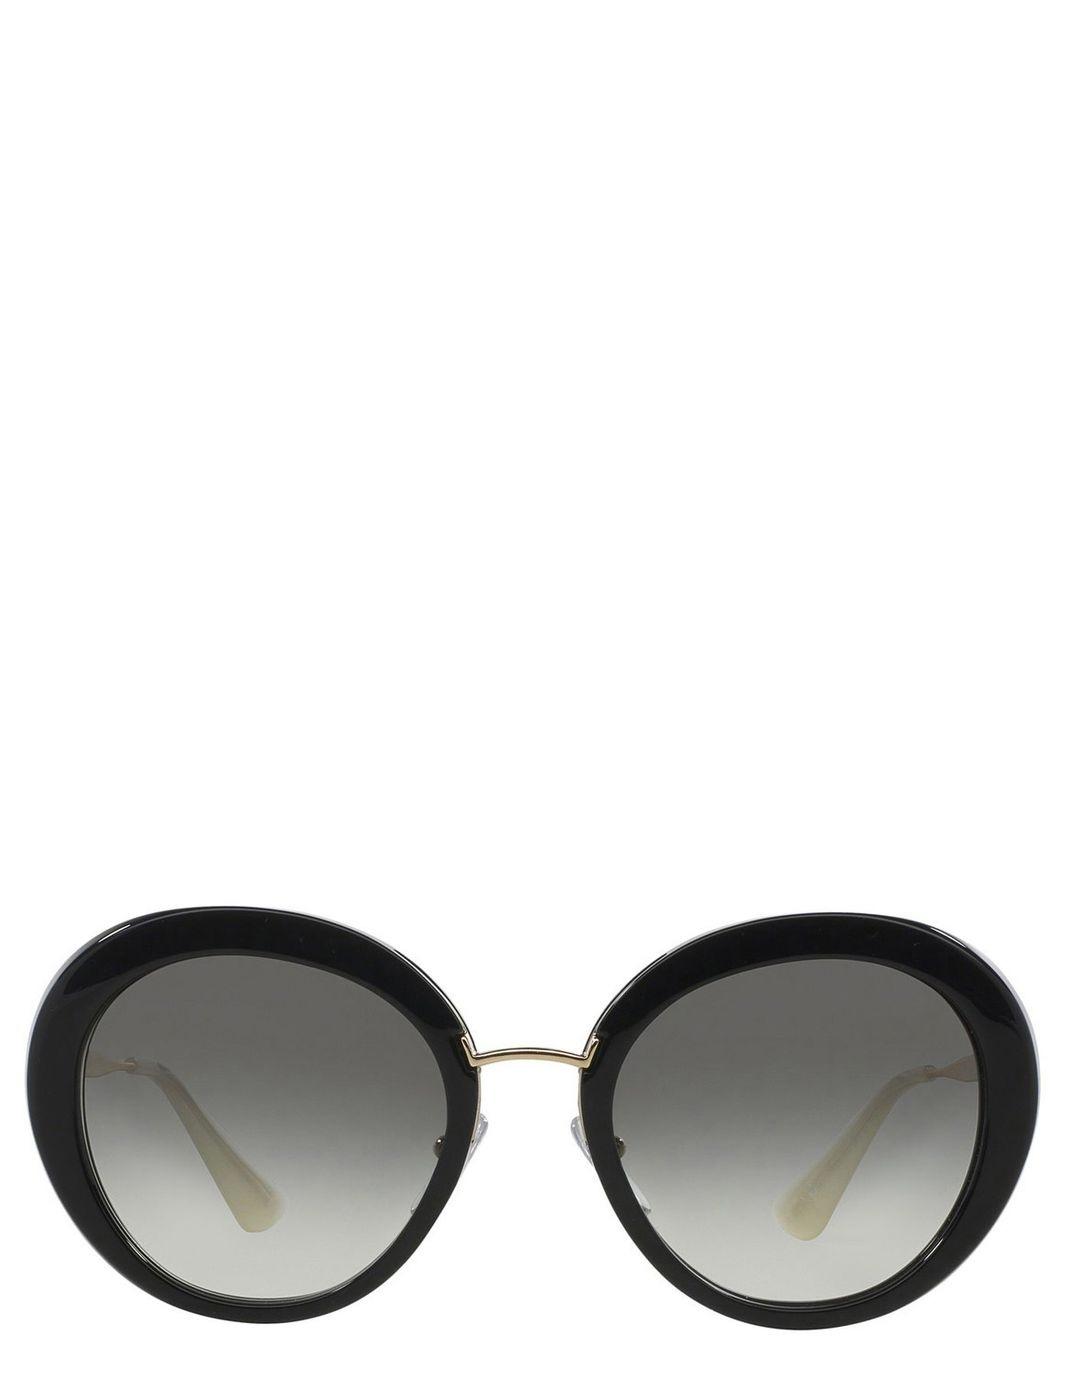 1ad9f1d060a low price prada pr 16qs sunglasses myer online 1f5a6 b9160